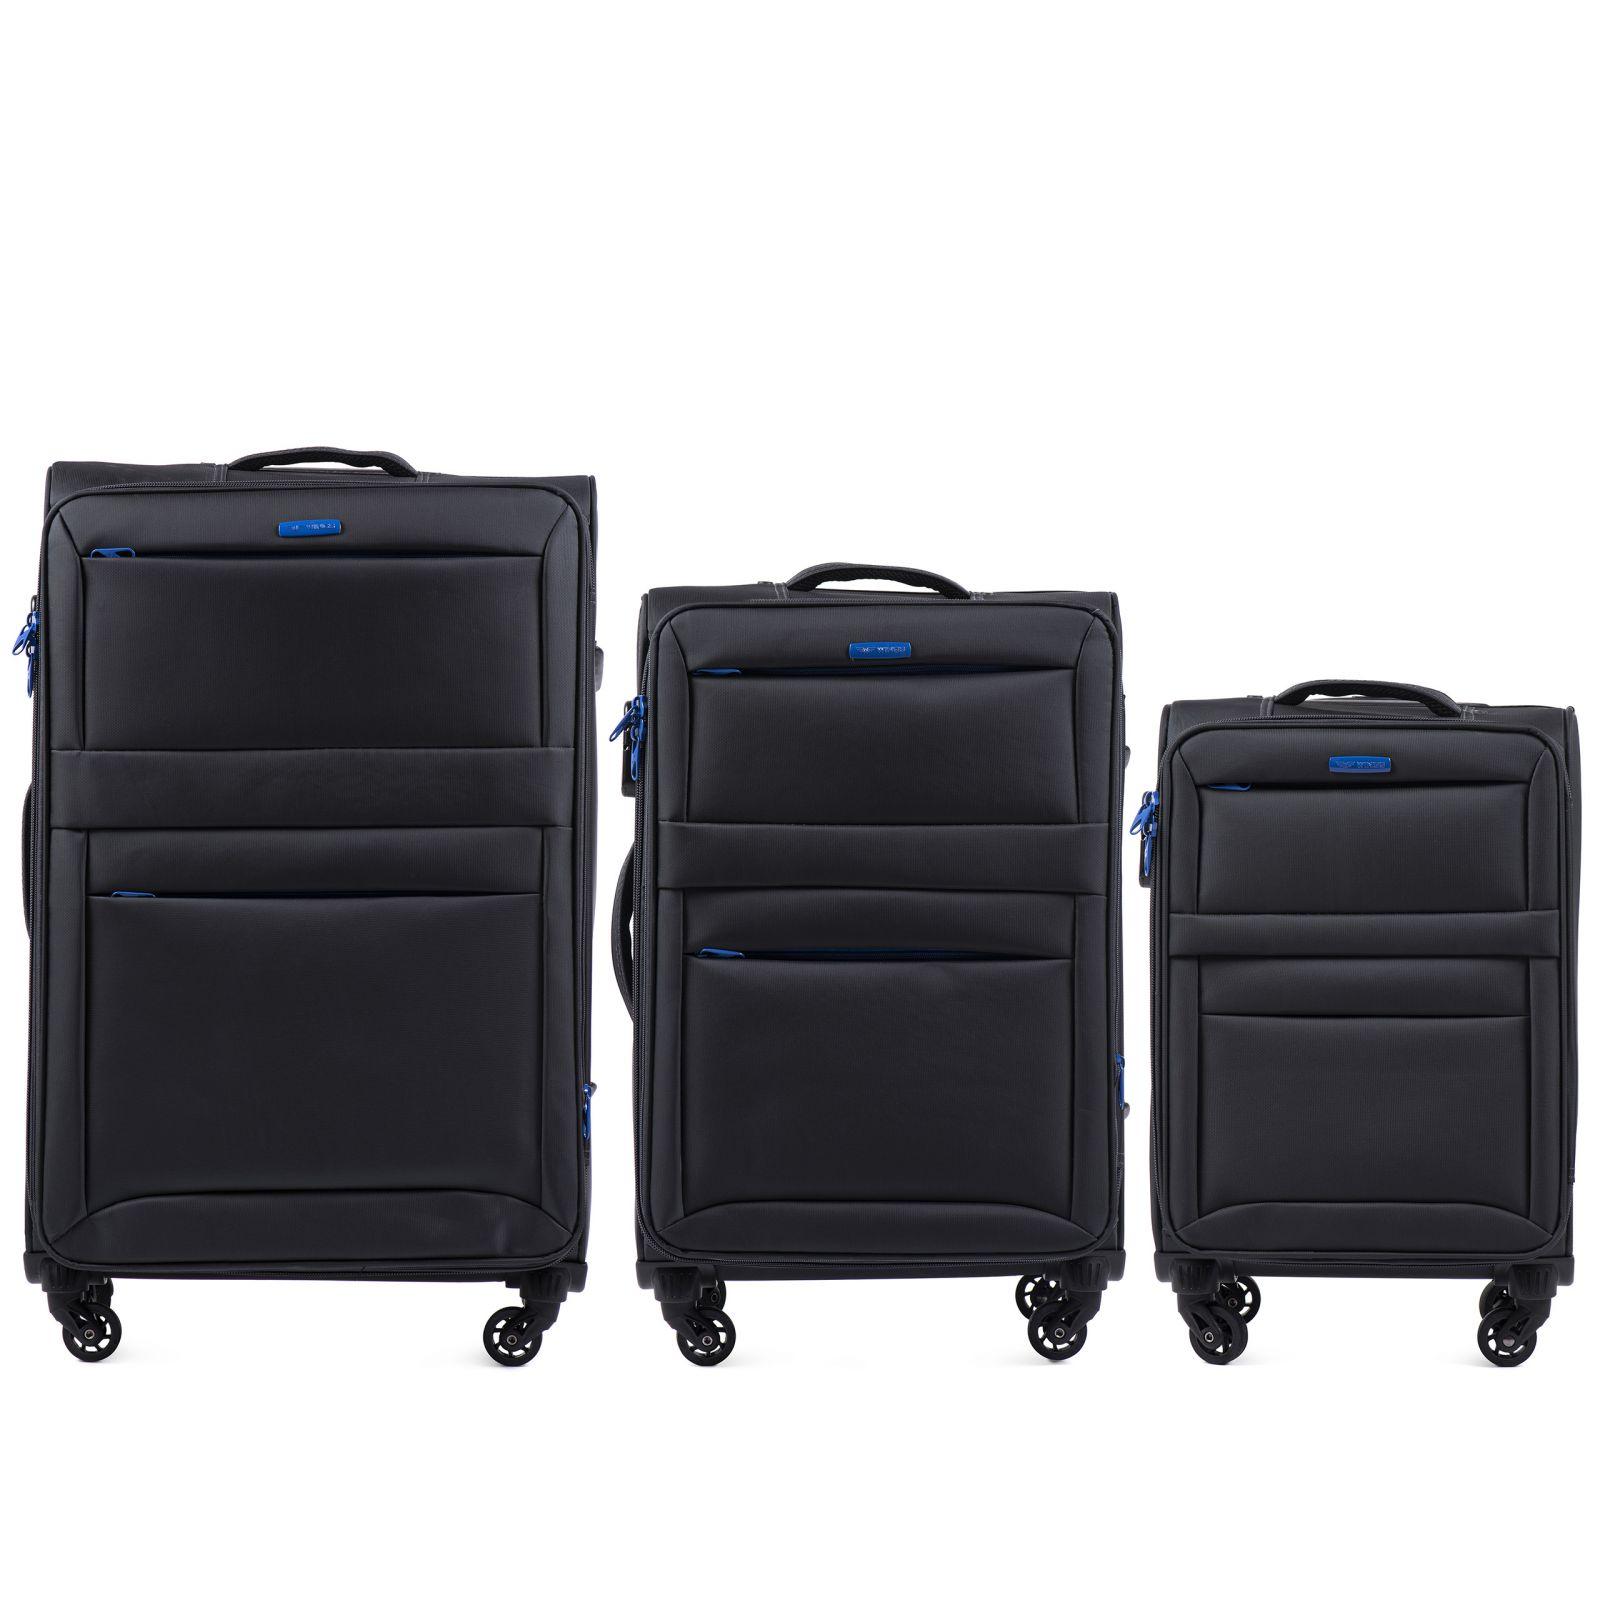 Sada 3 textilních kufrů WINGS 2861 DARK GREY L/M/S